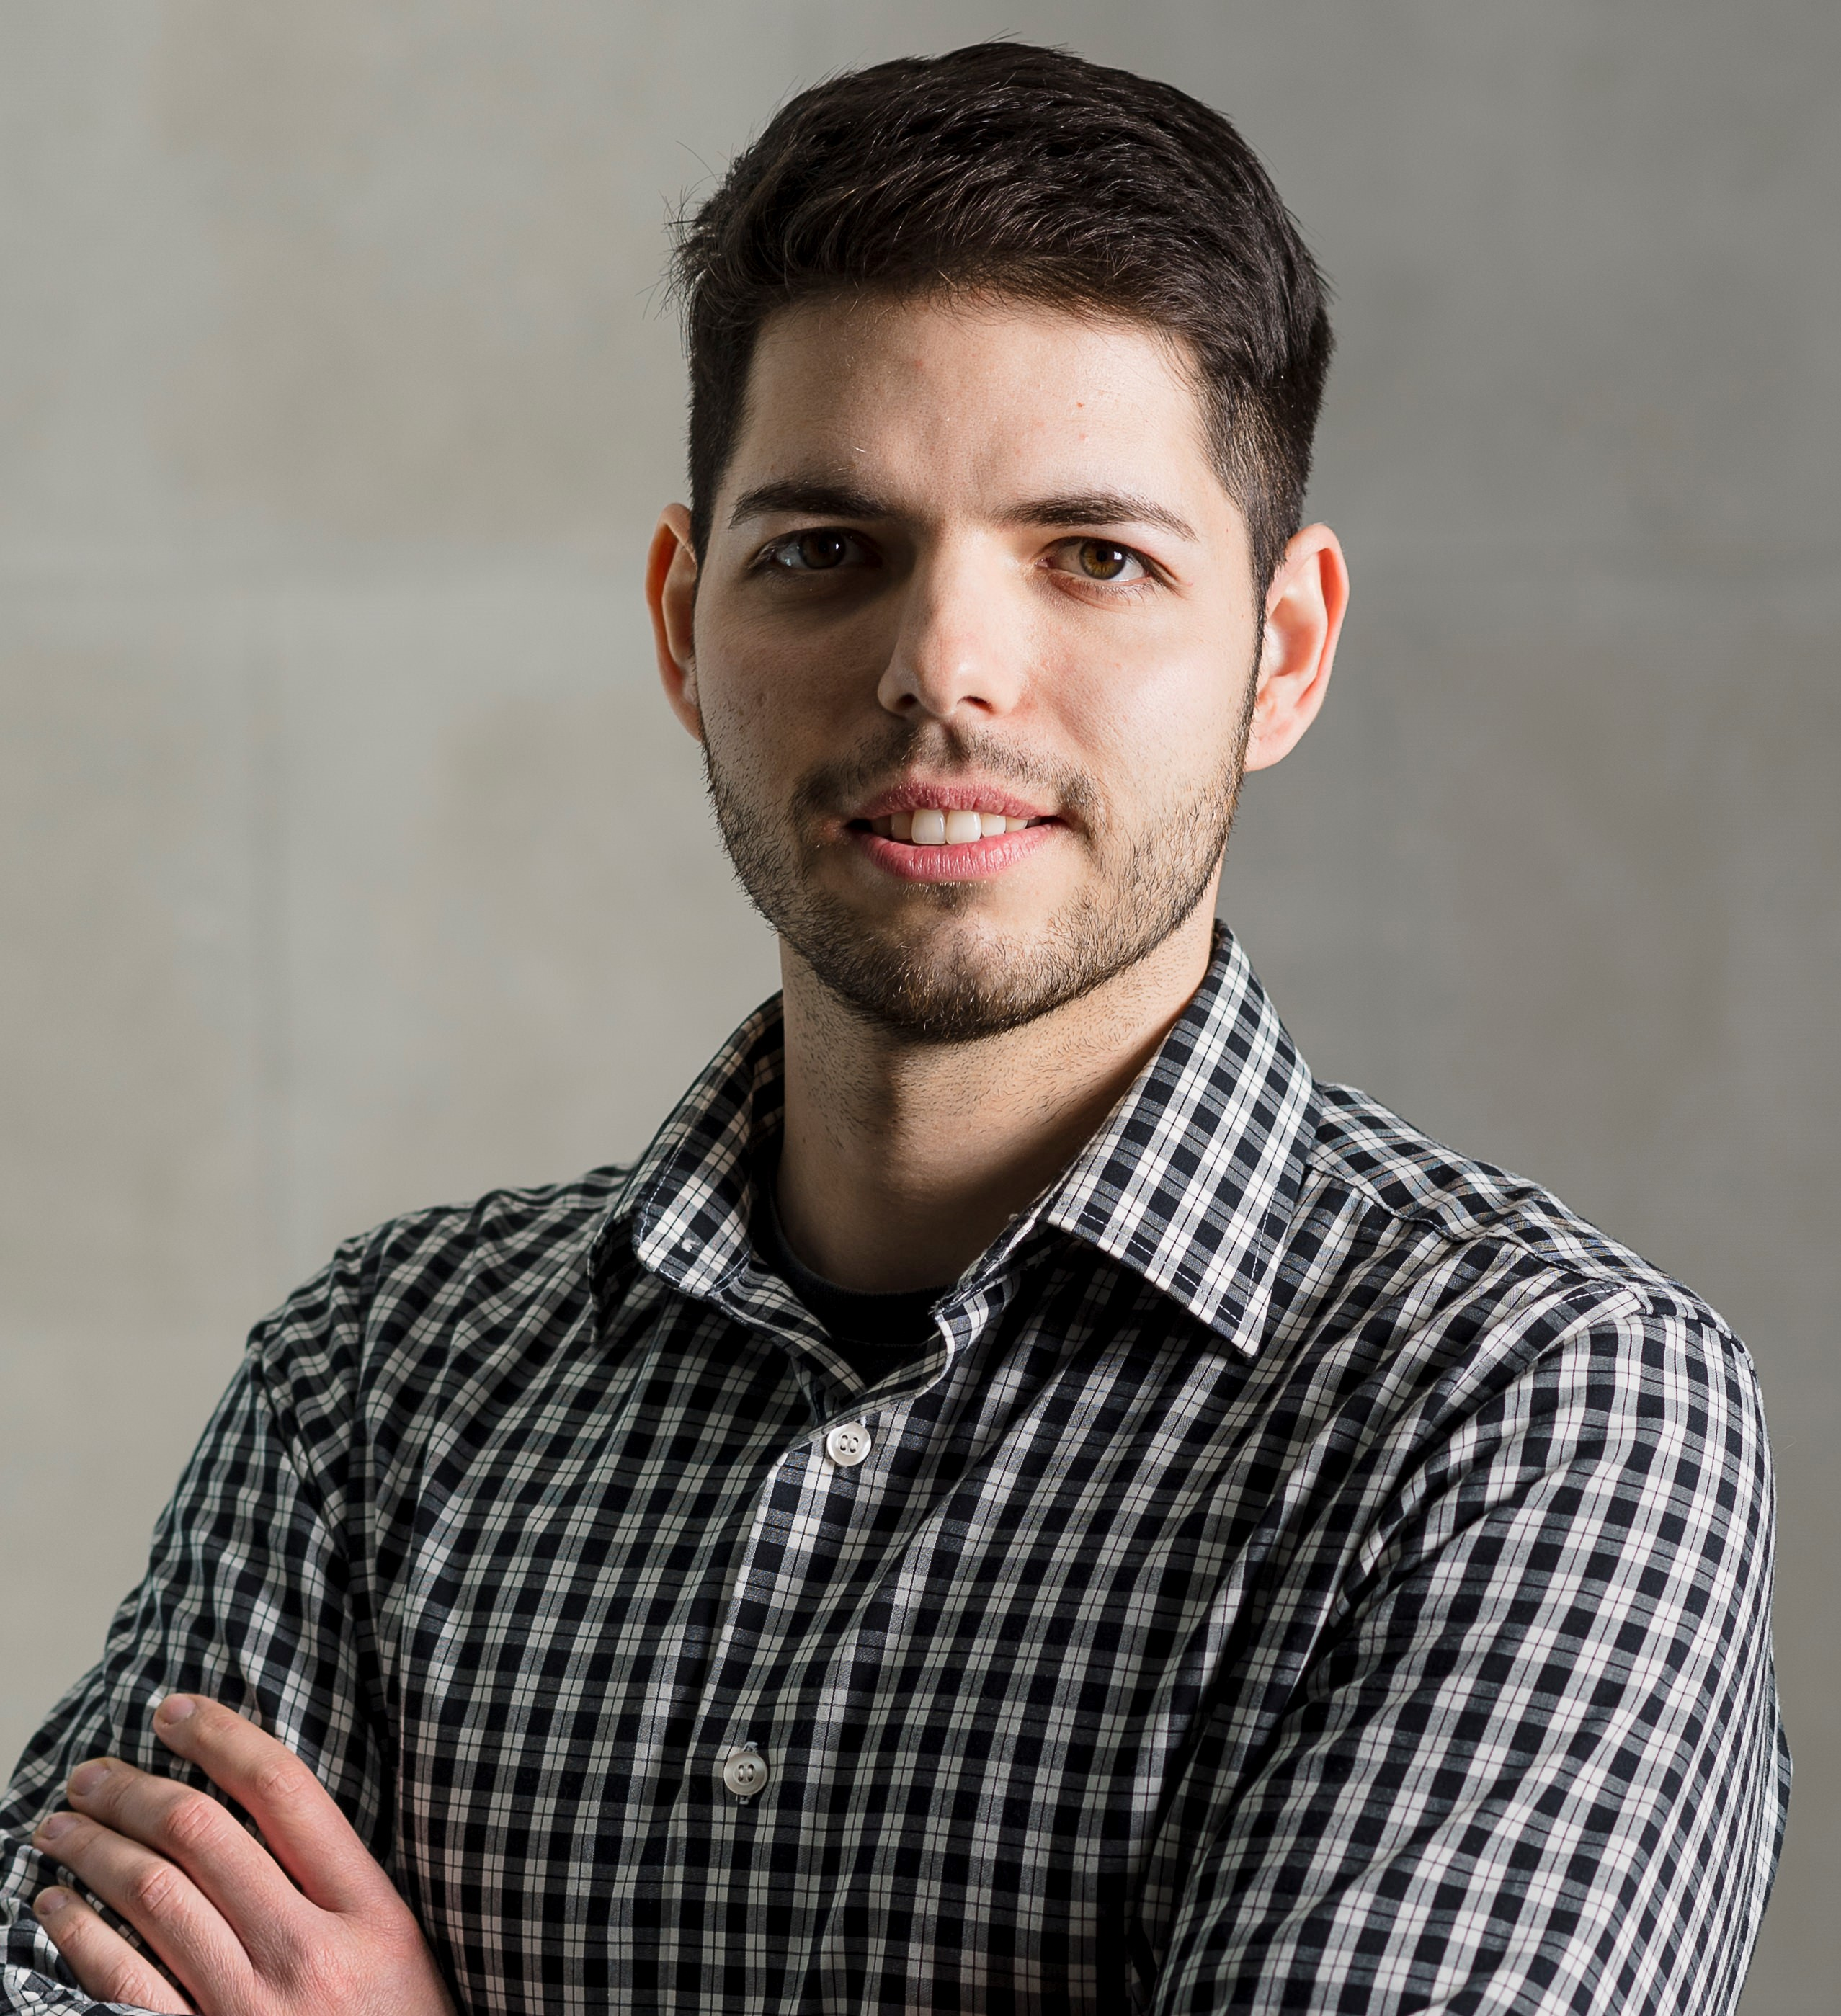 Daniel Gallardo